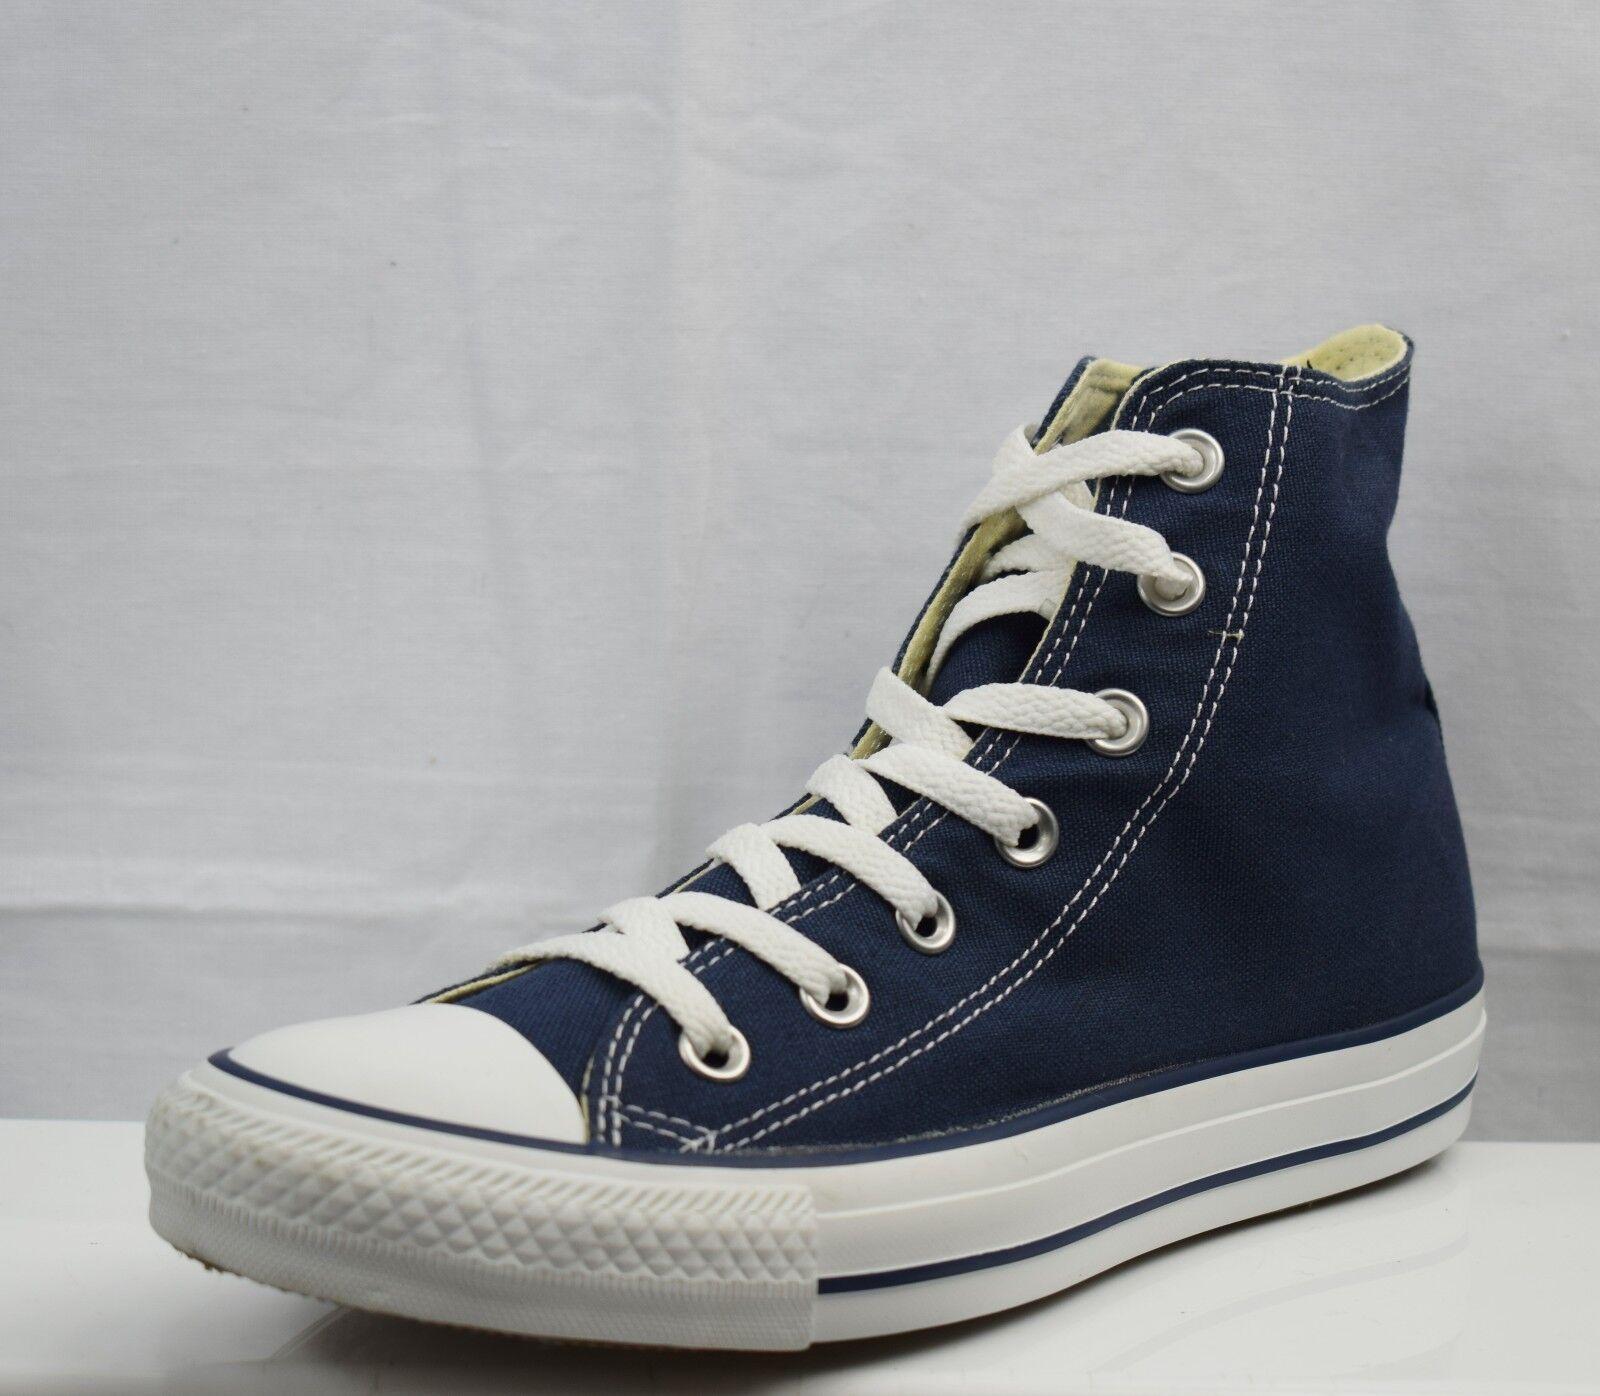 Converse All Star HI Baskets Neuf Taille UK 7 (AV18)